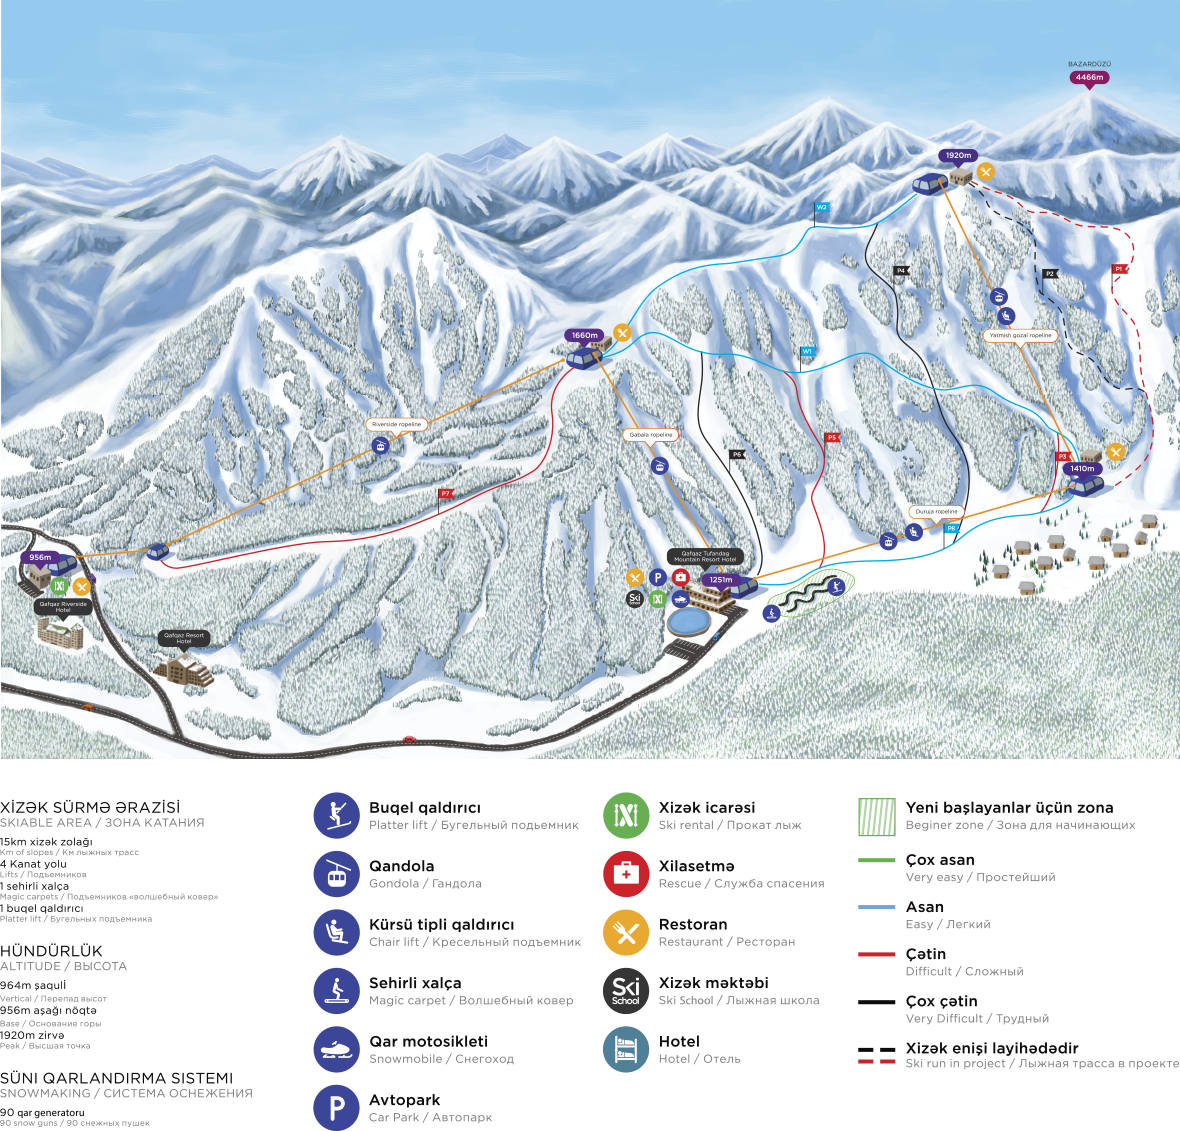 Недорогие горнолыжные курорты Азербайджана